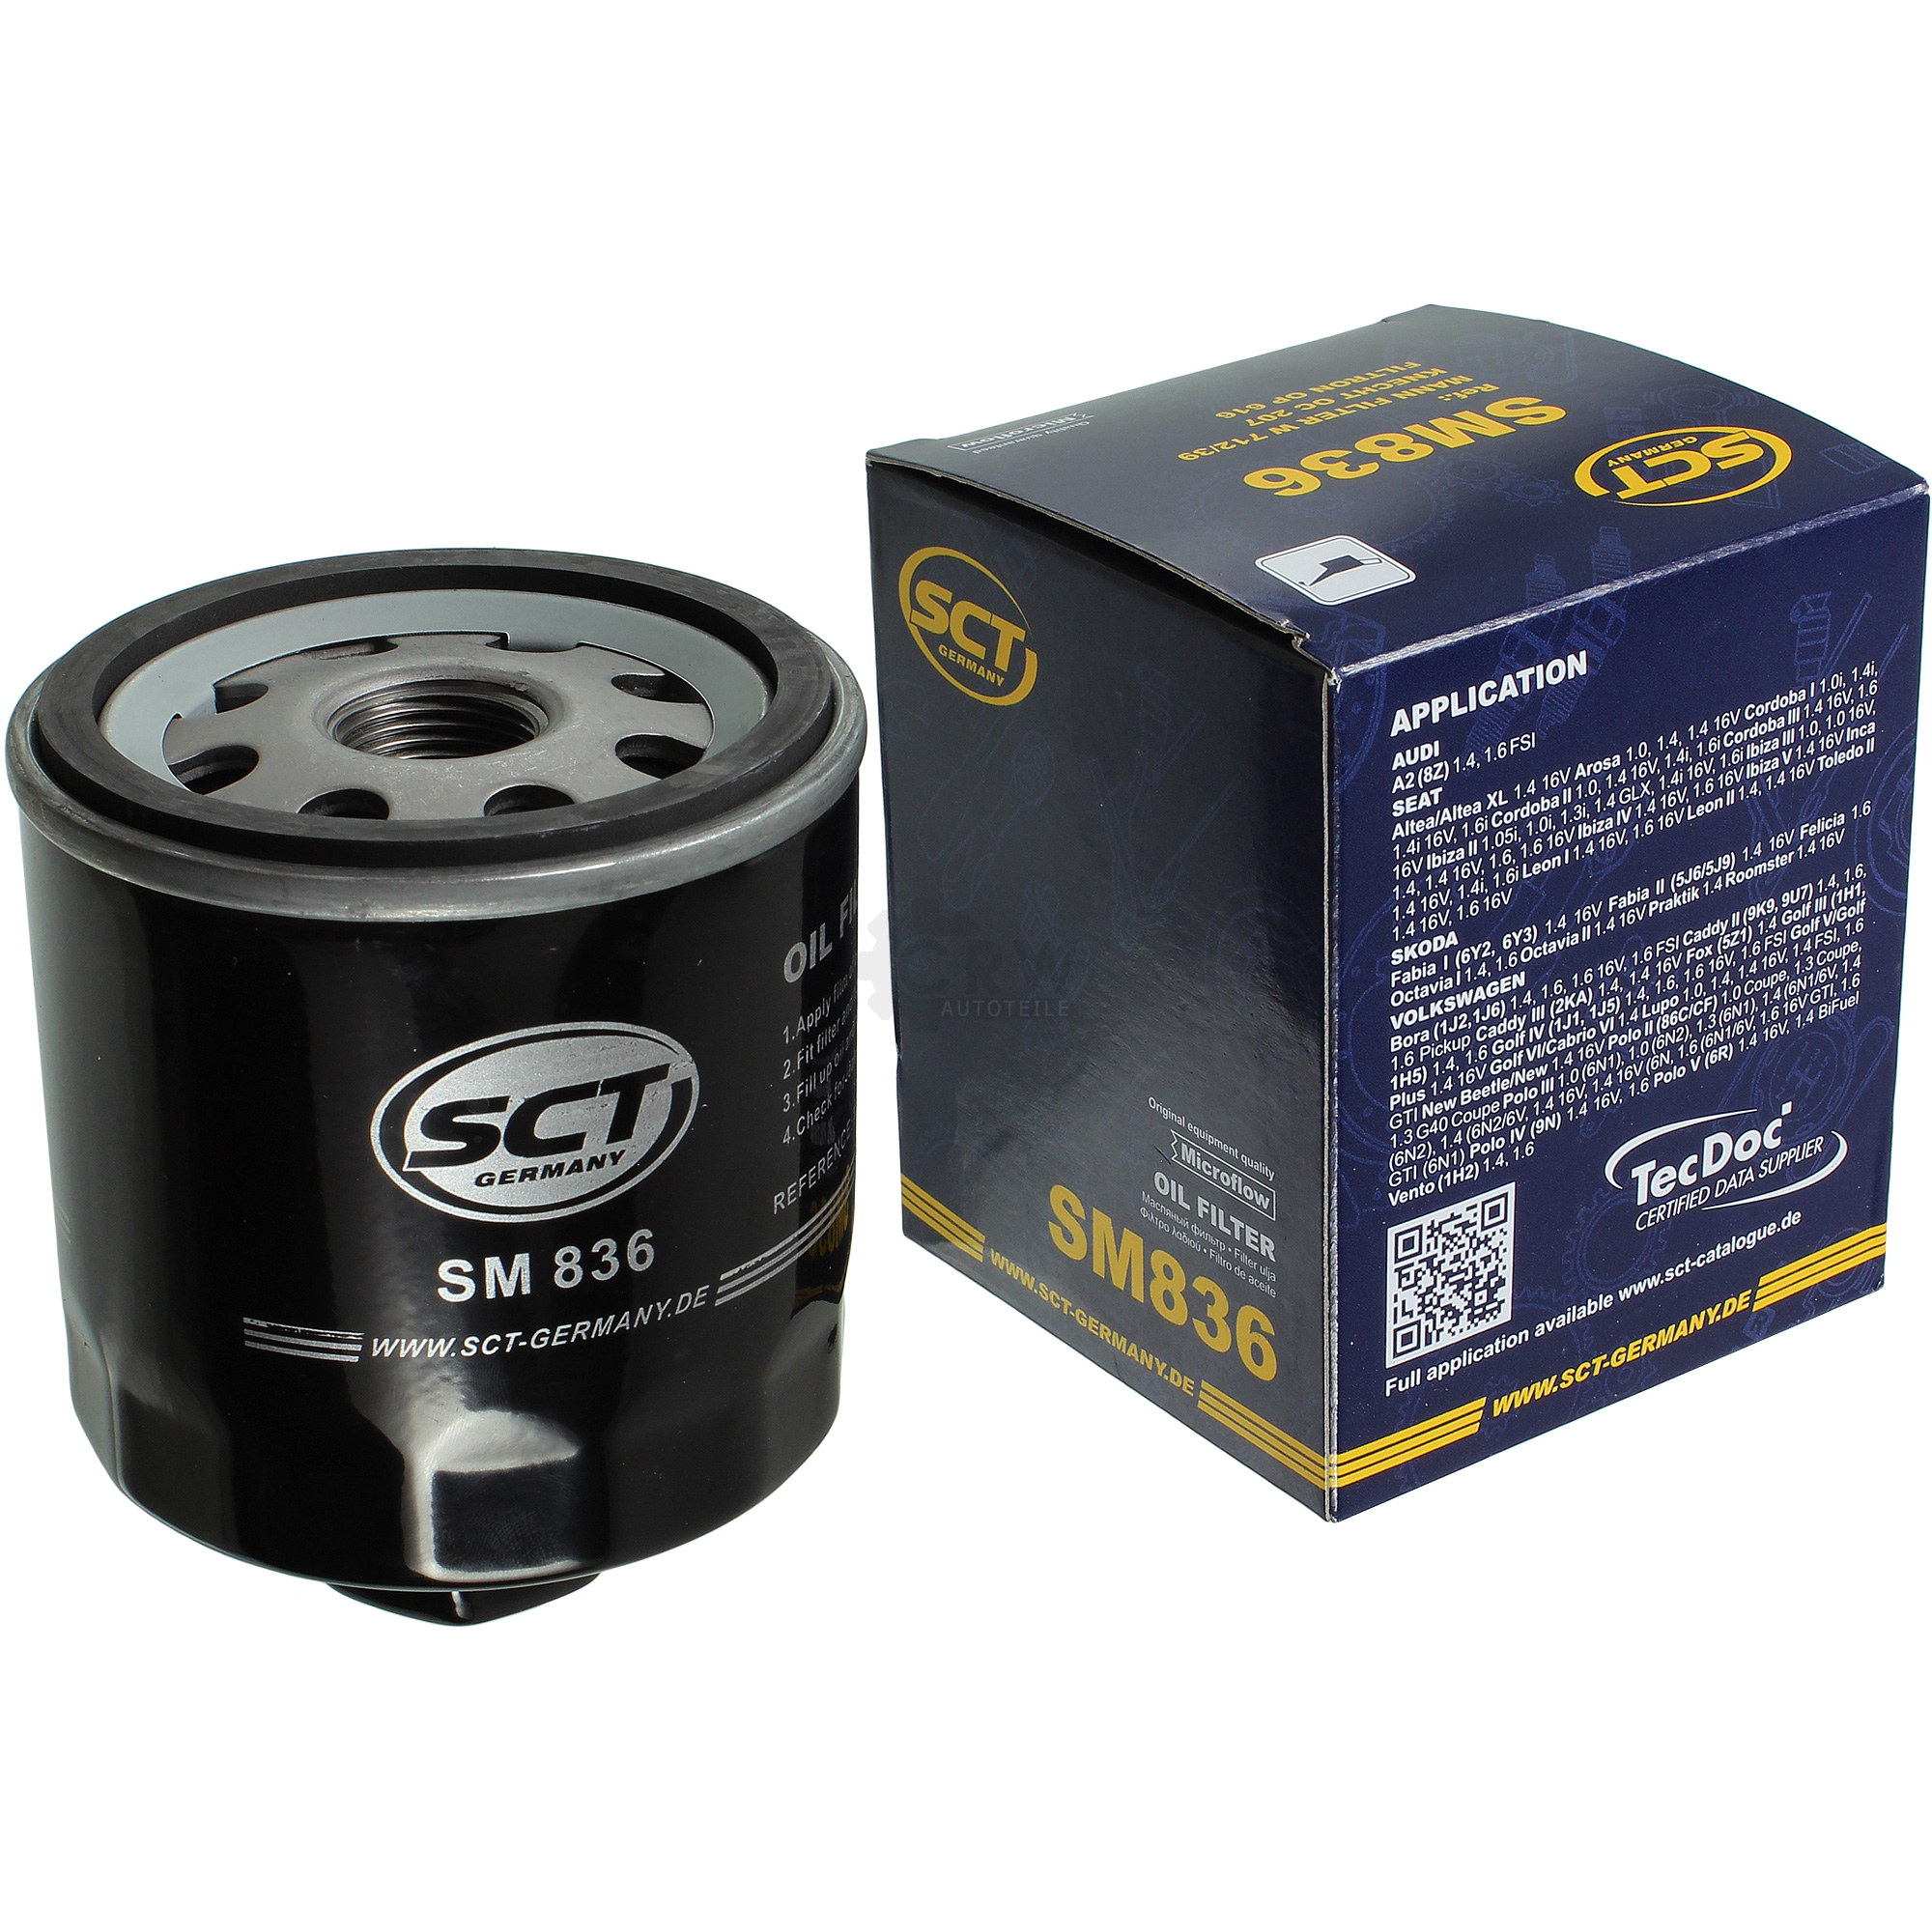 Cambio-de-aceite-set-5l-MANNOL-energy-premium-5w-30-aceite-del-motor-filtro-sct-kit-10138625 miniatura 4